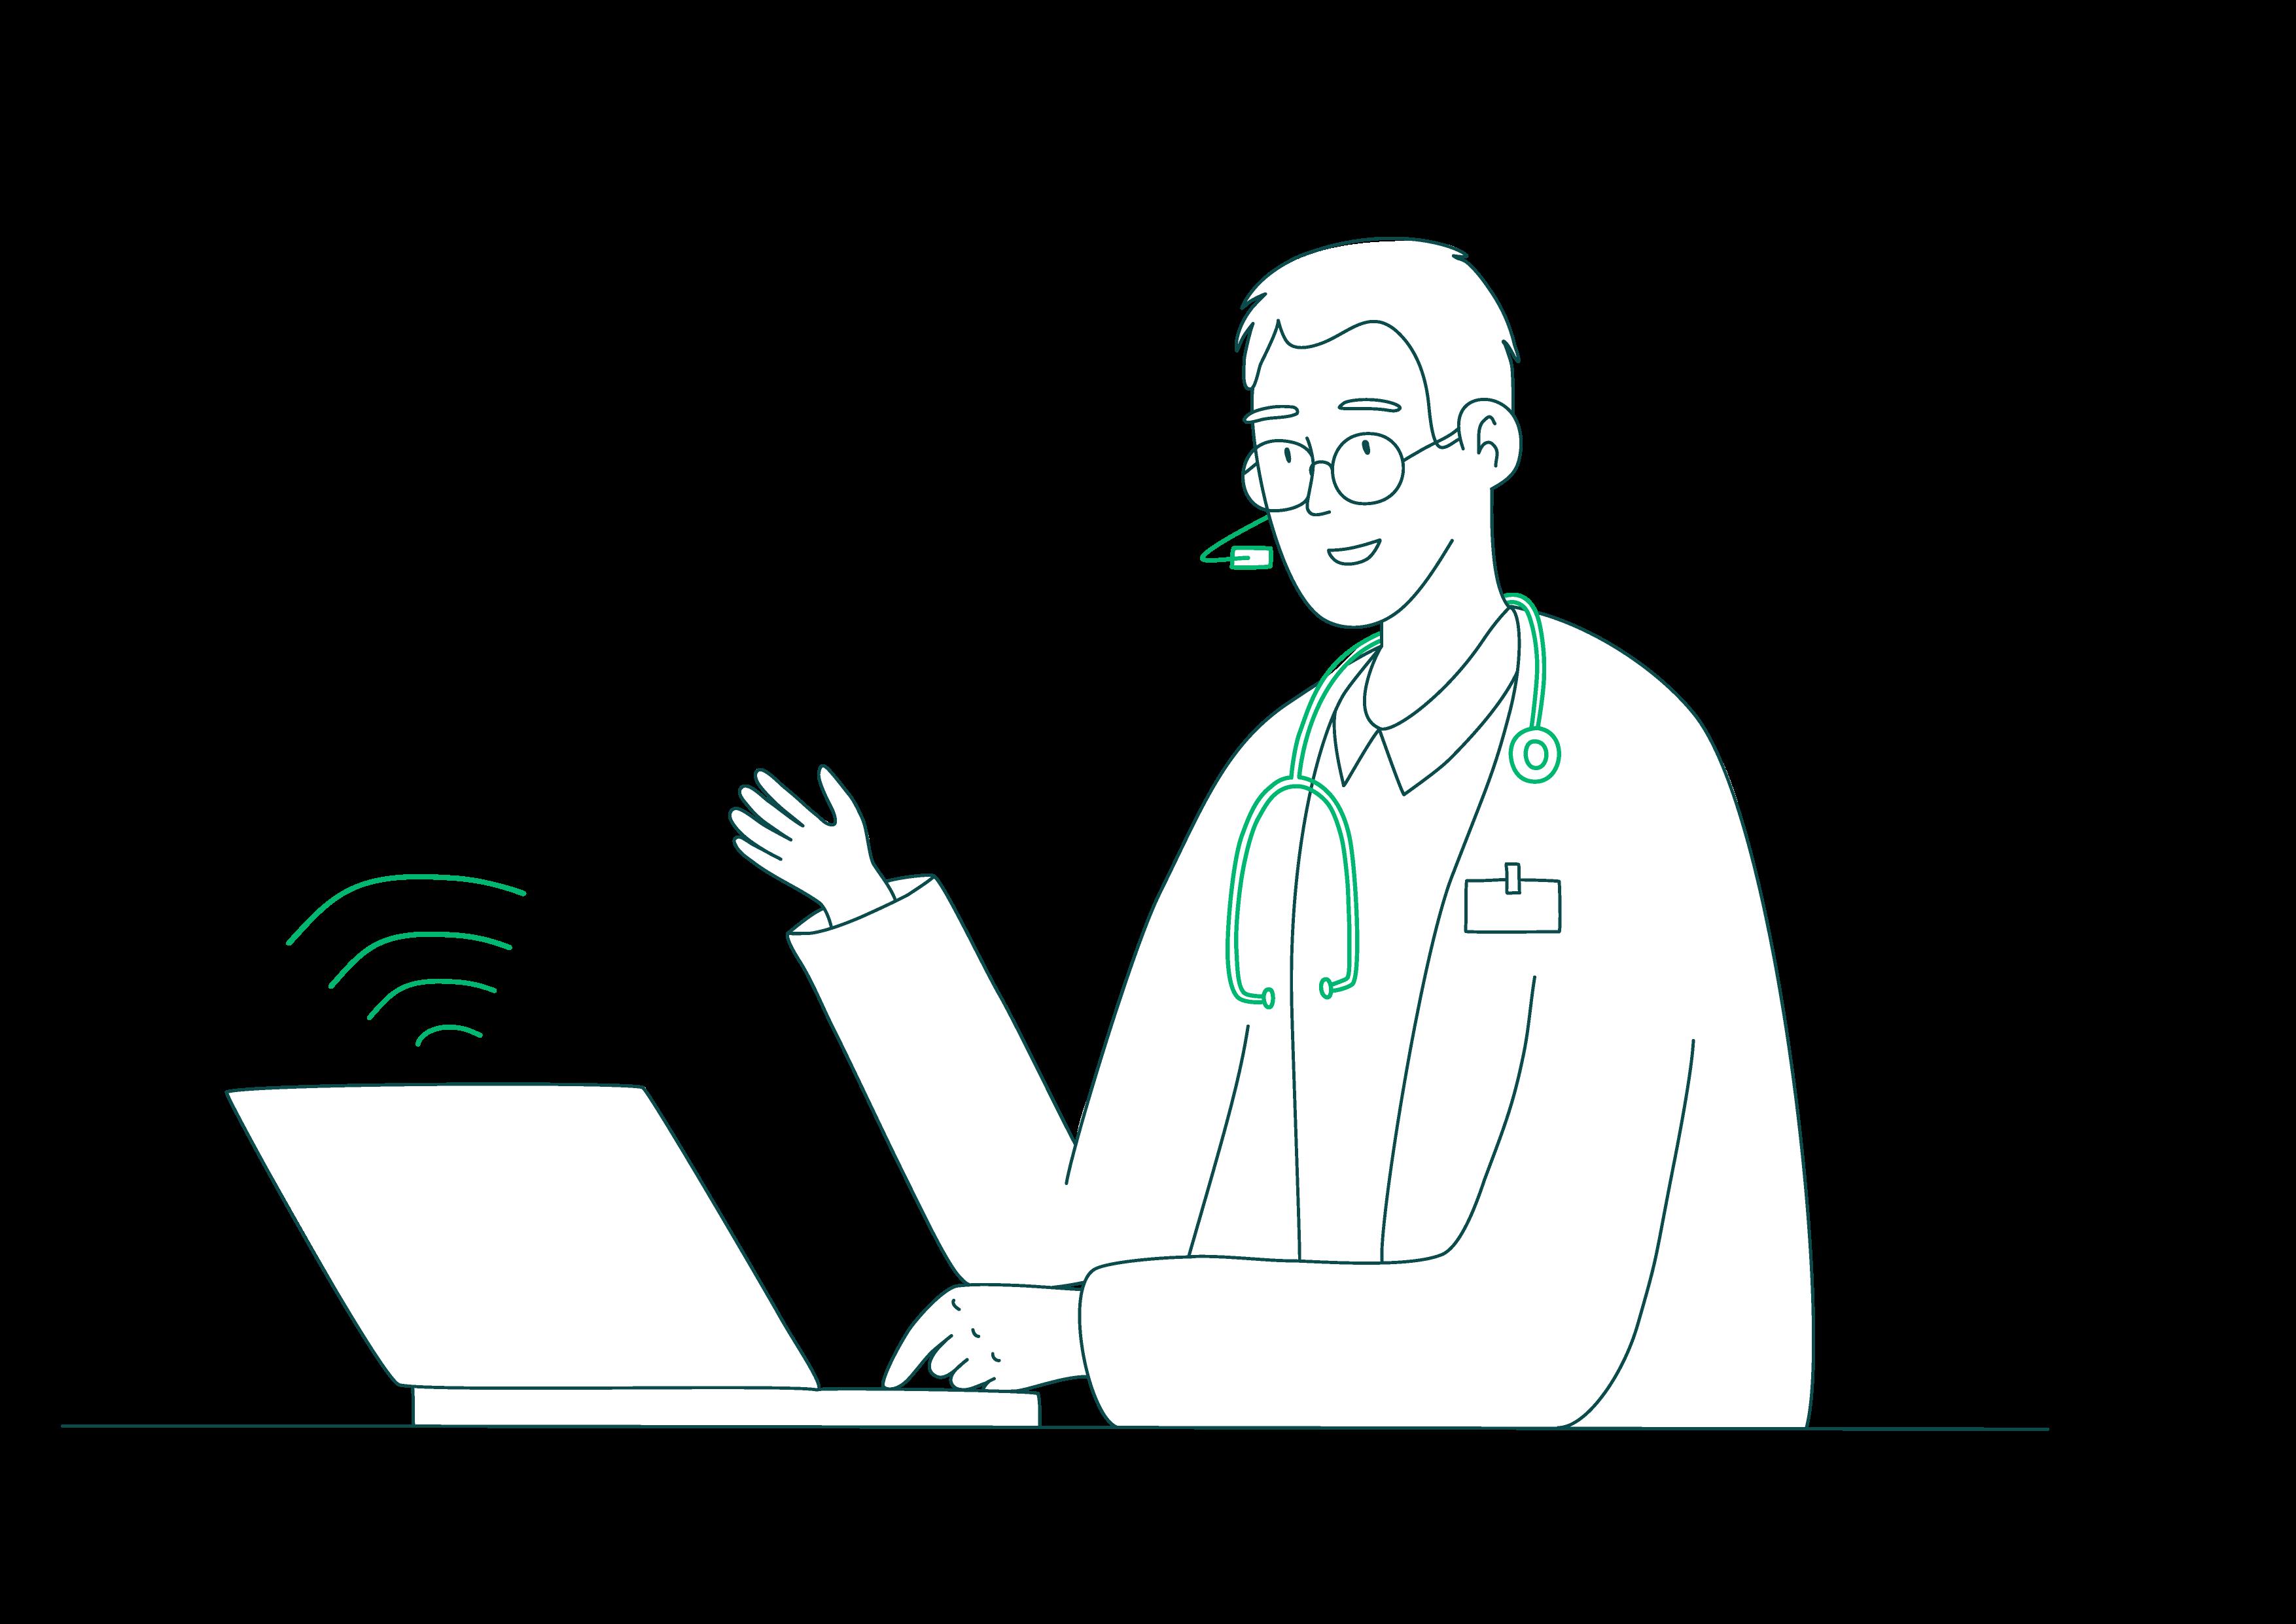 Smart Care Illustration 2